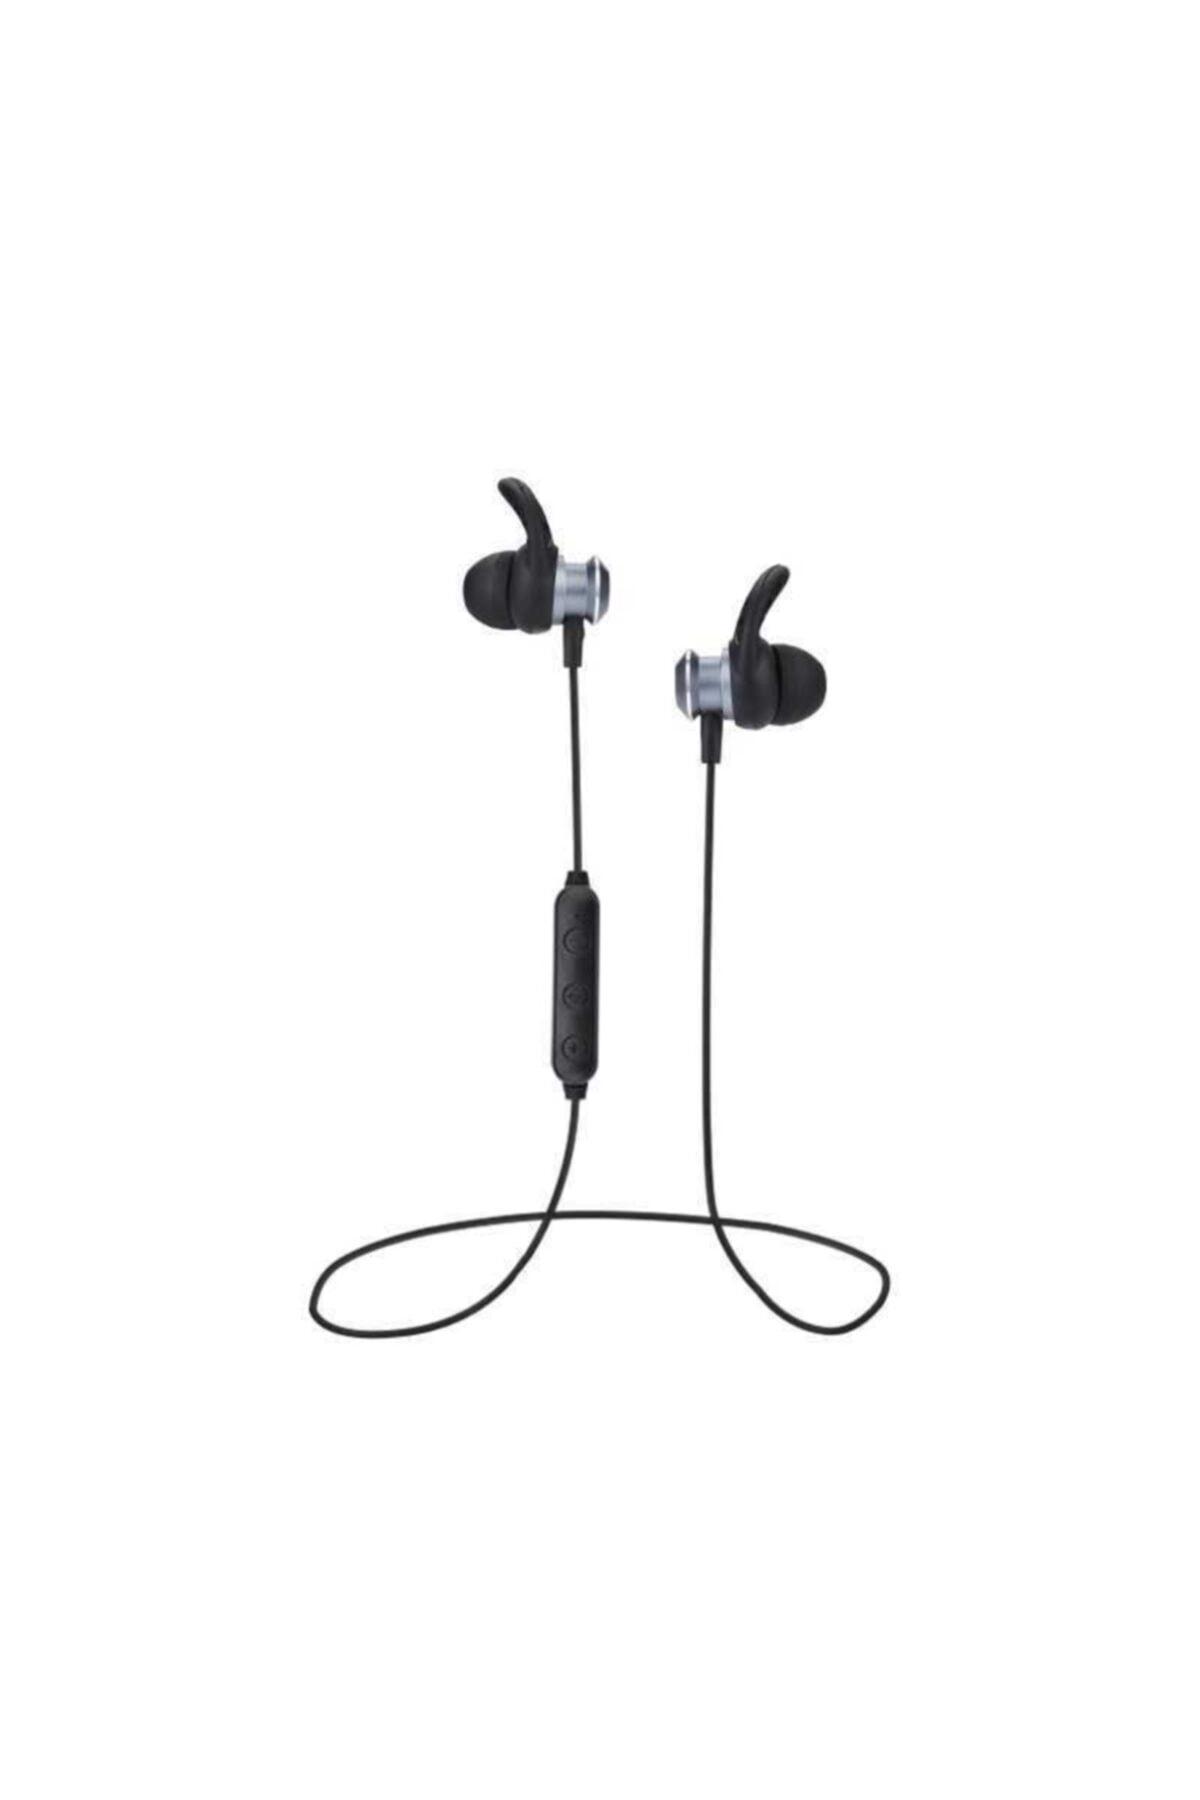 zore Füme Bt-zr1 Bluetooth Kulaklık 1